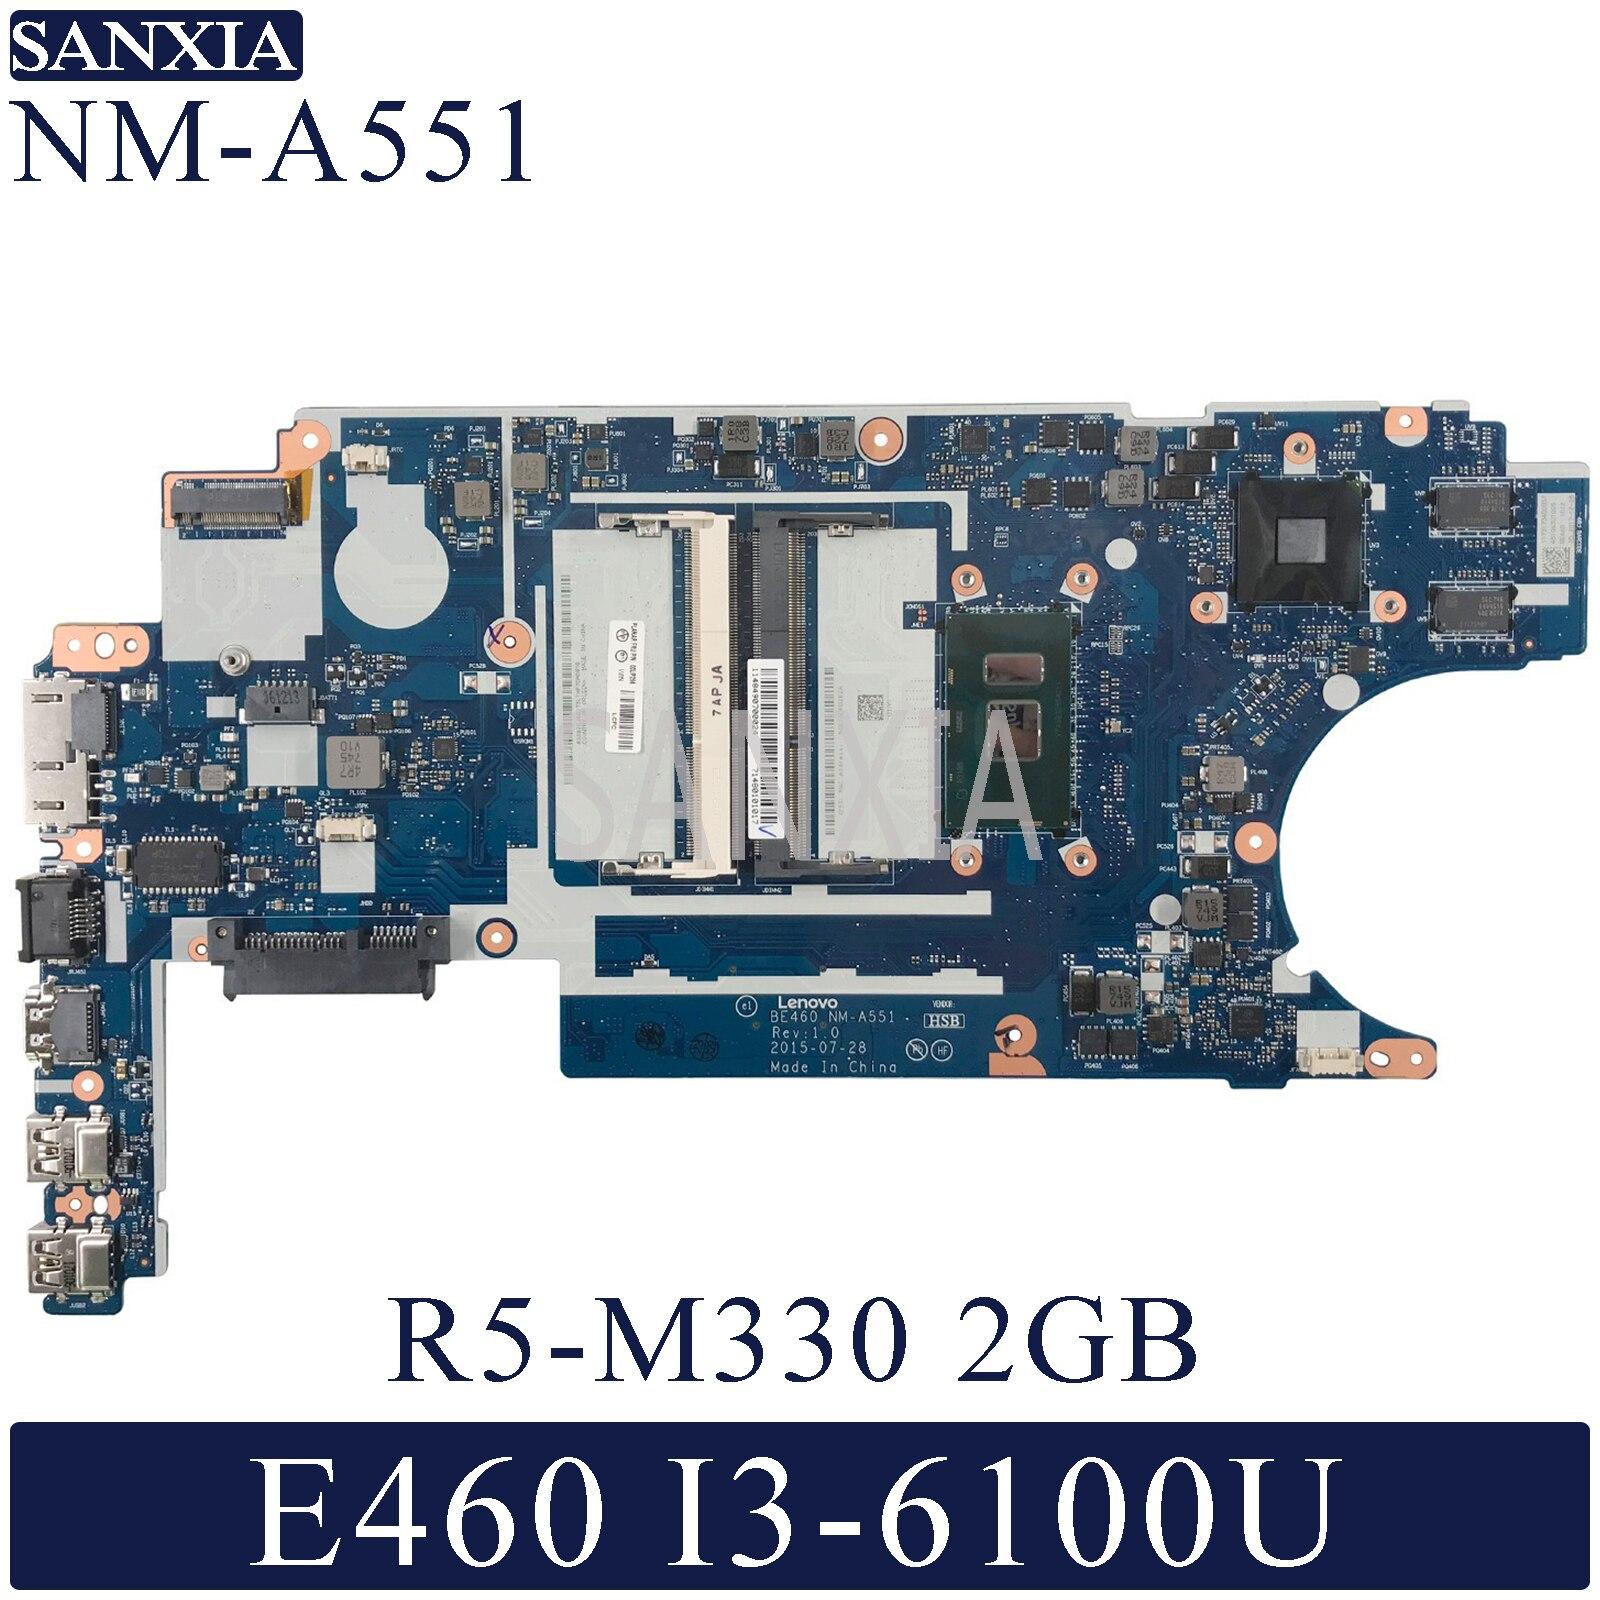 KEFU NM-A551 Laptop Motherboard For Lenovo Thinkpad E460 Original Mainboard I3-6100U R5-M330 2GB